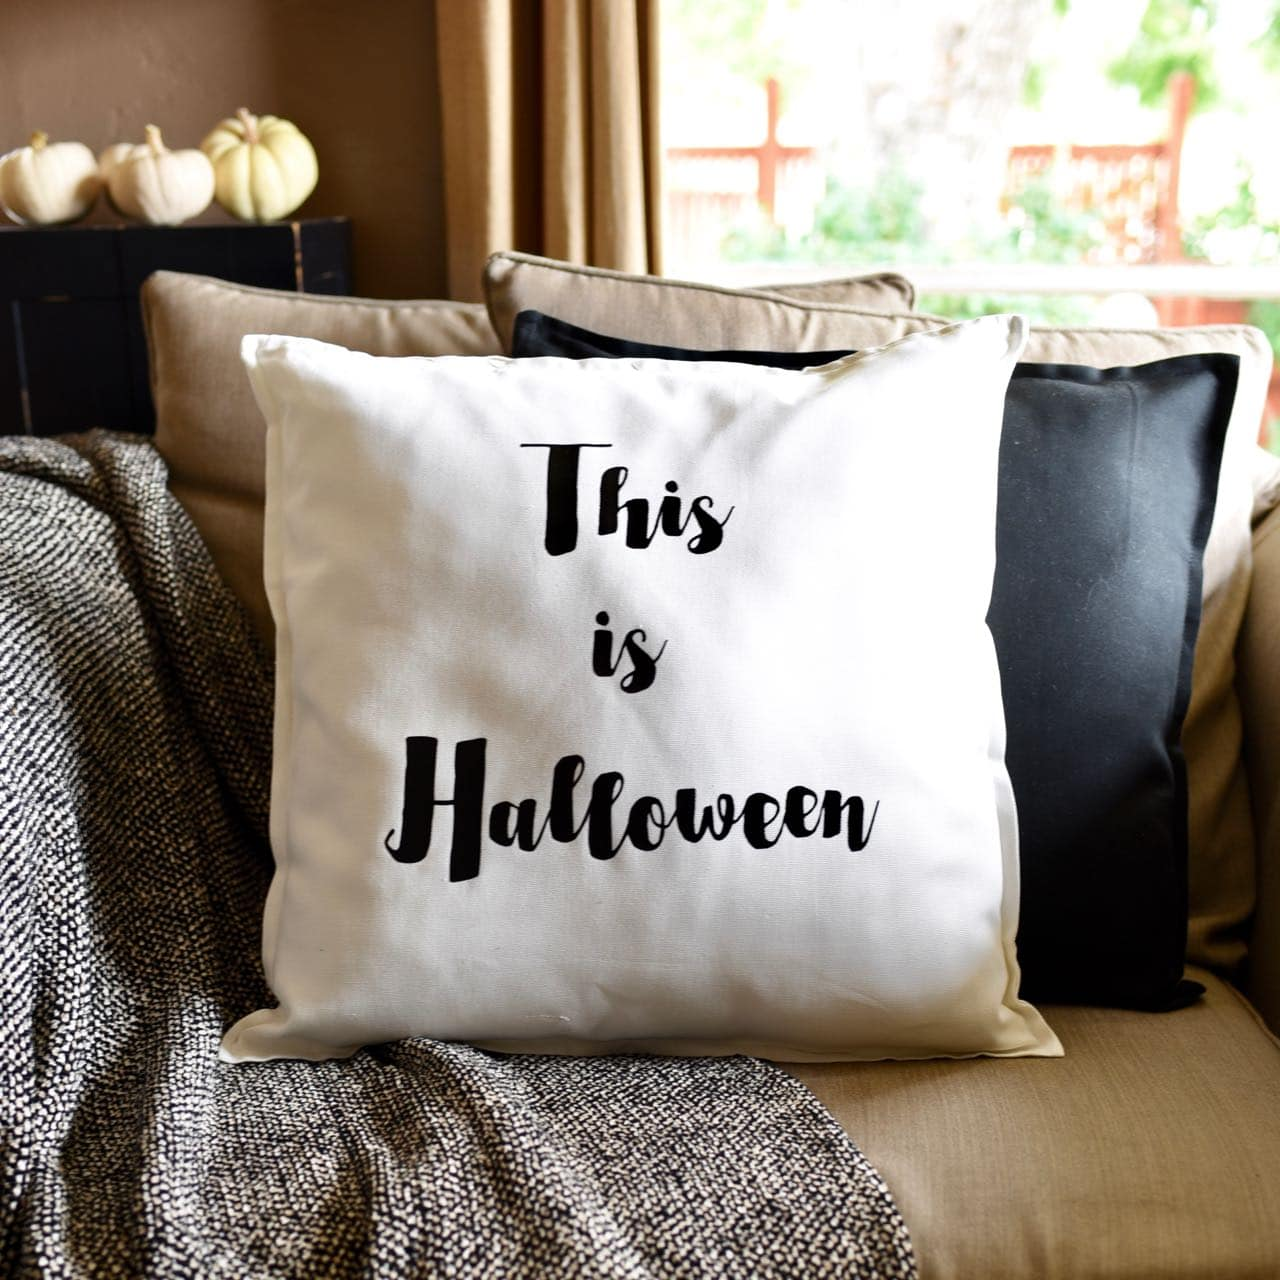 Diy Halloween Pillow With Cricut Explore Air 2 Make Life Lovely